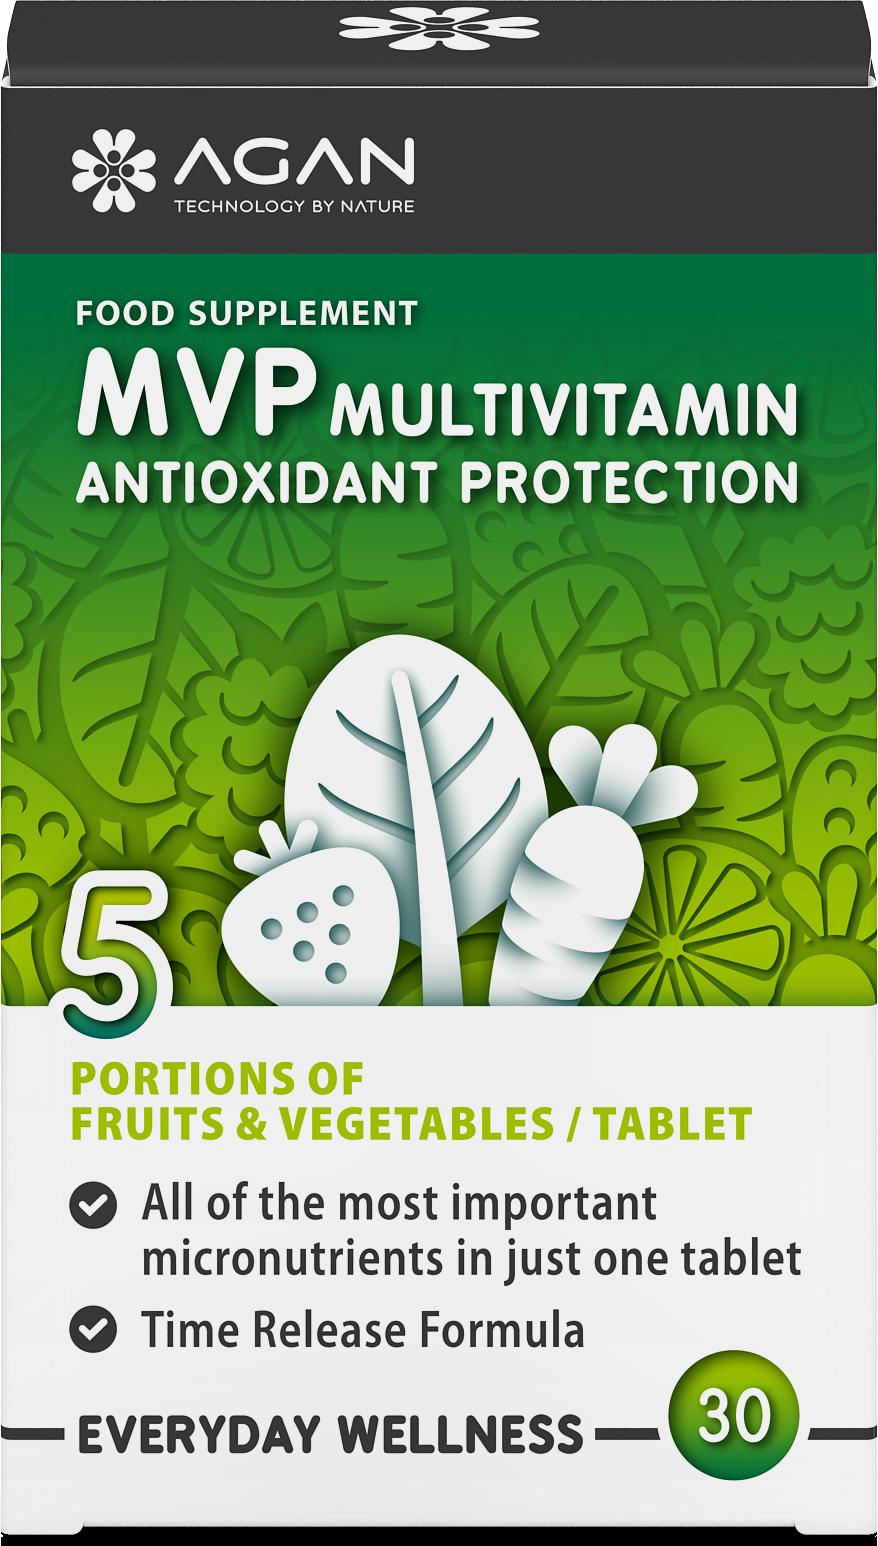 MVP MULTIVITAMIN ANTIOXIDANT PROTECTION